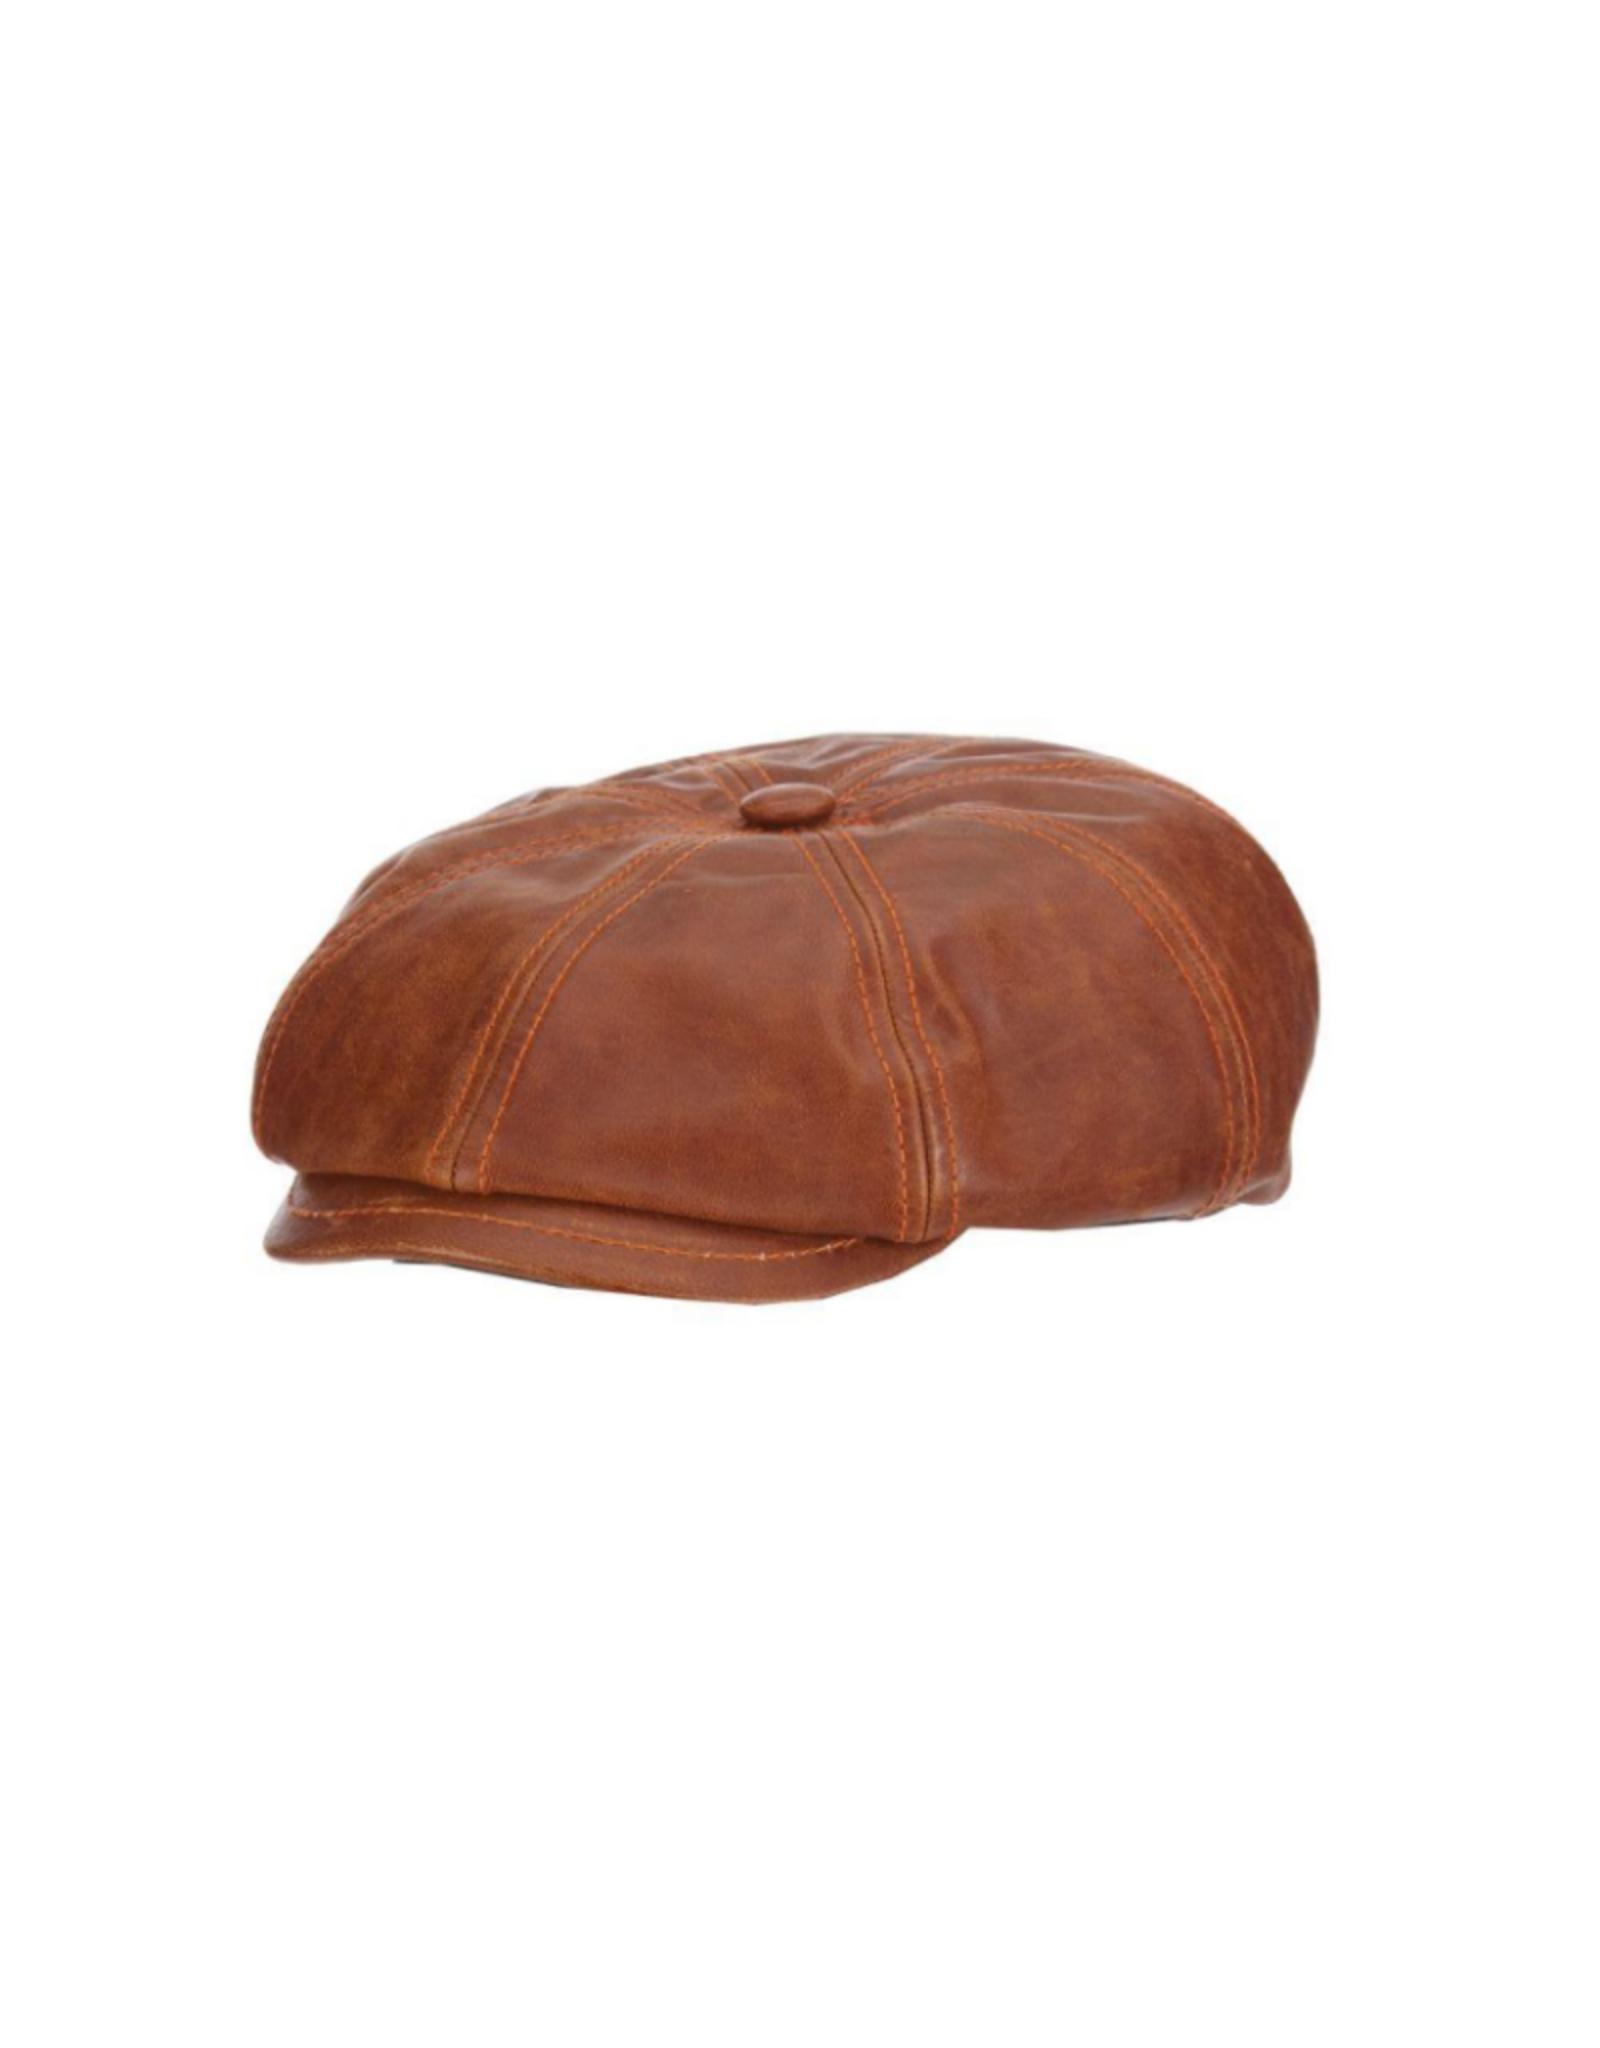 HAT-8 PANEL-HARPER-LEATHER